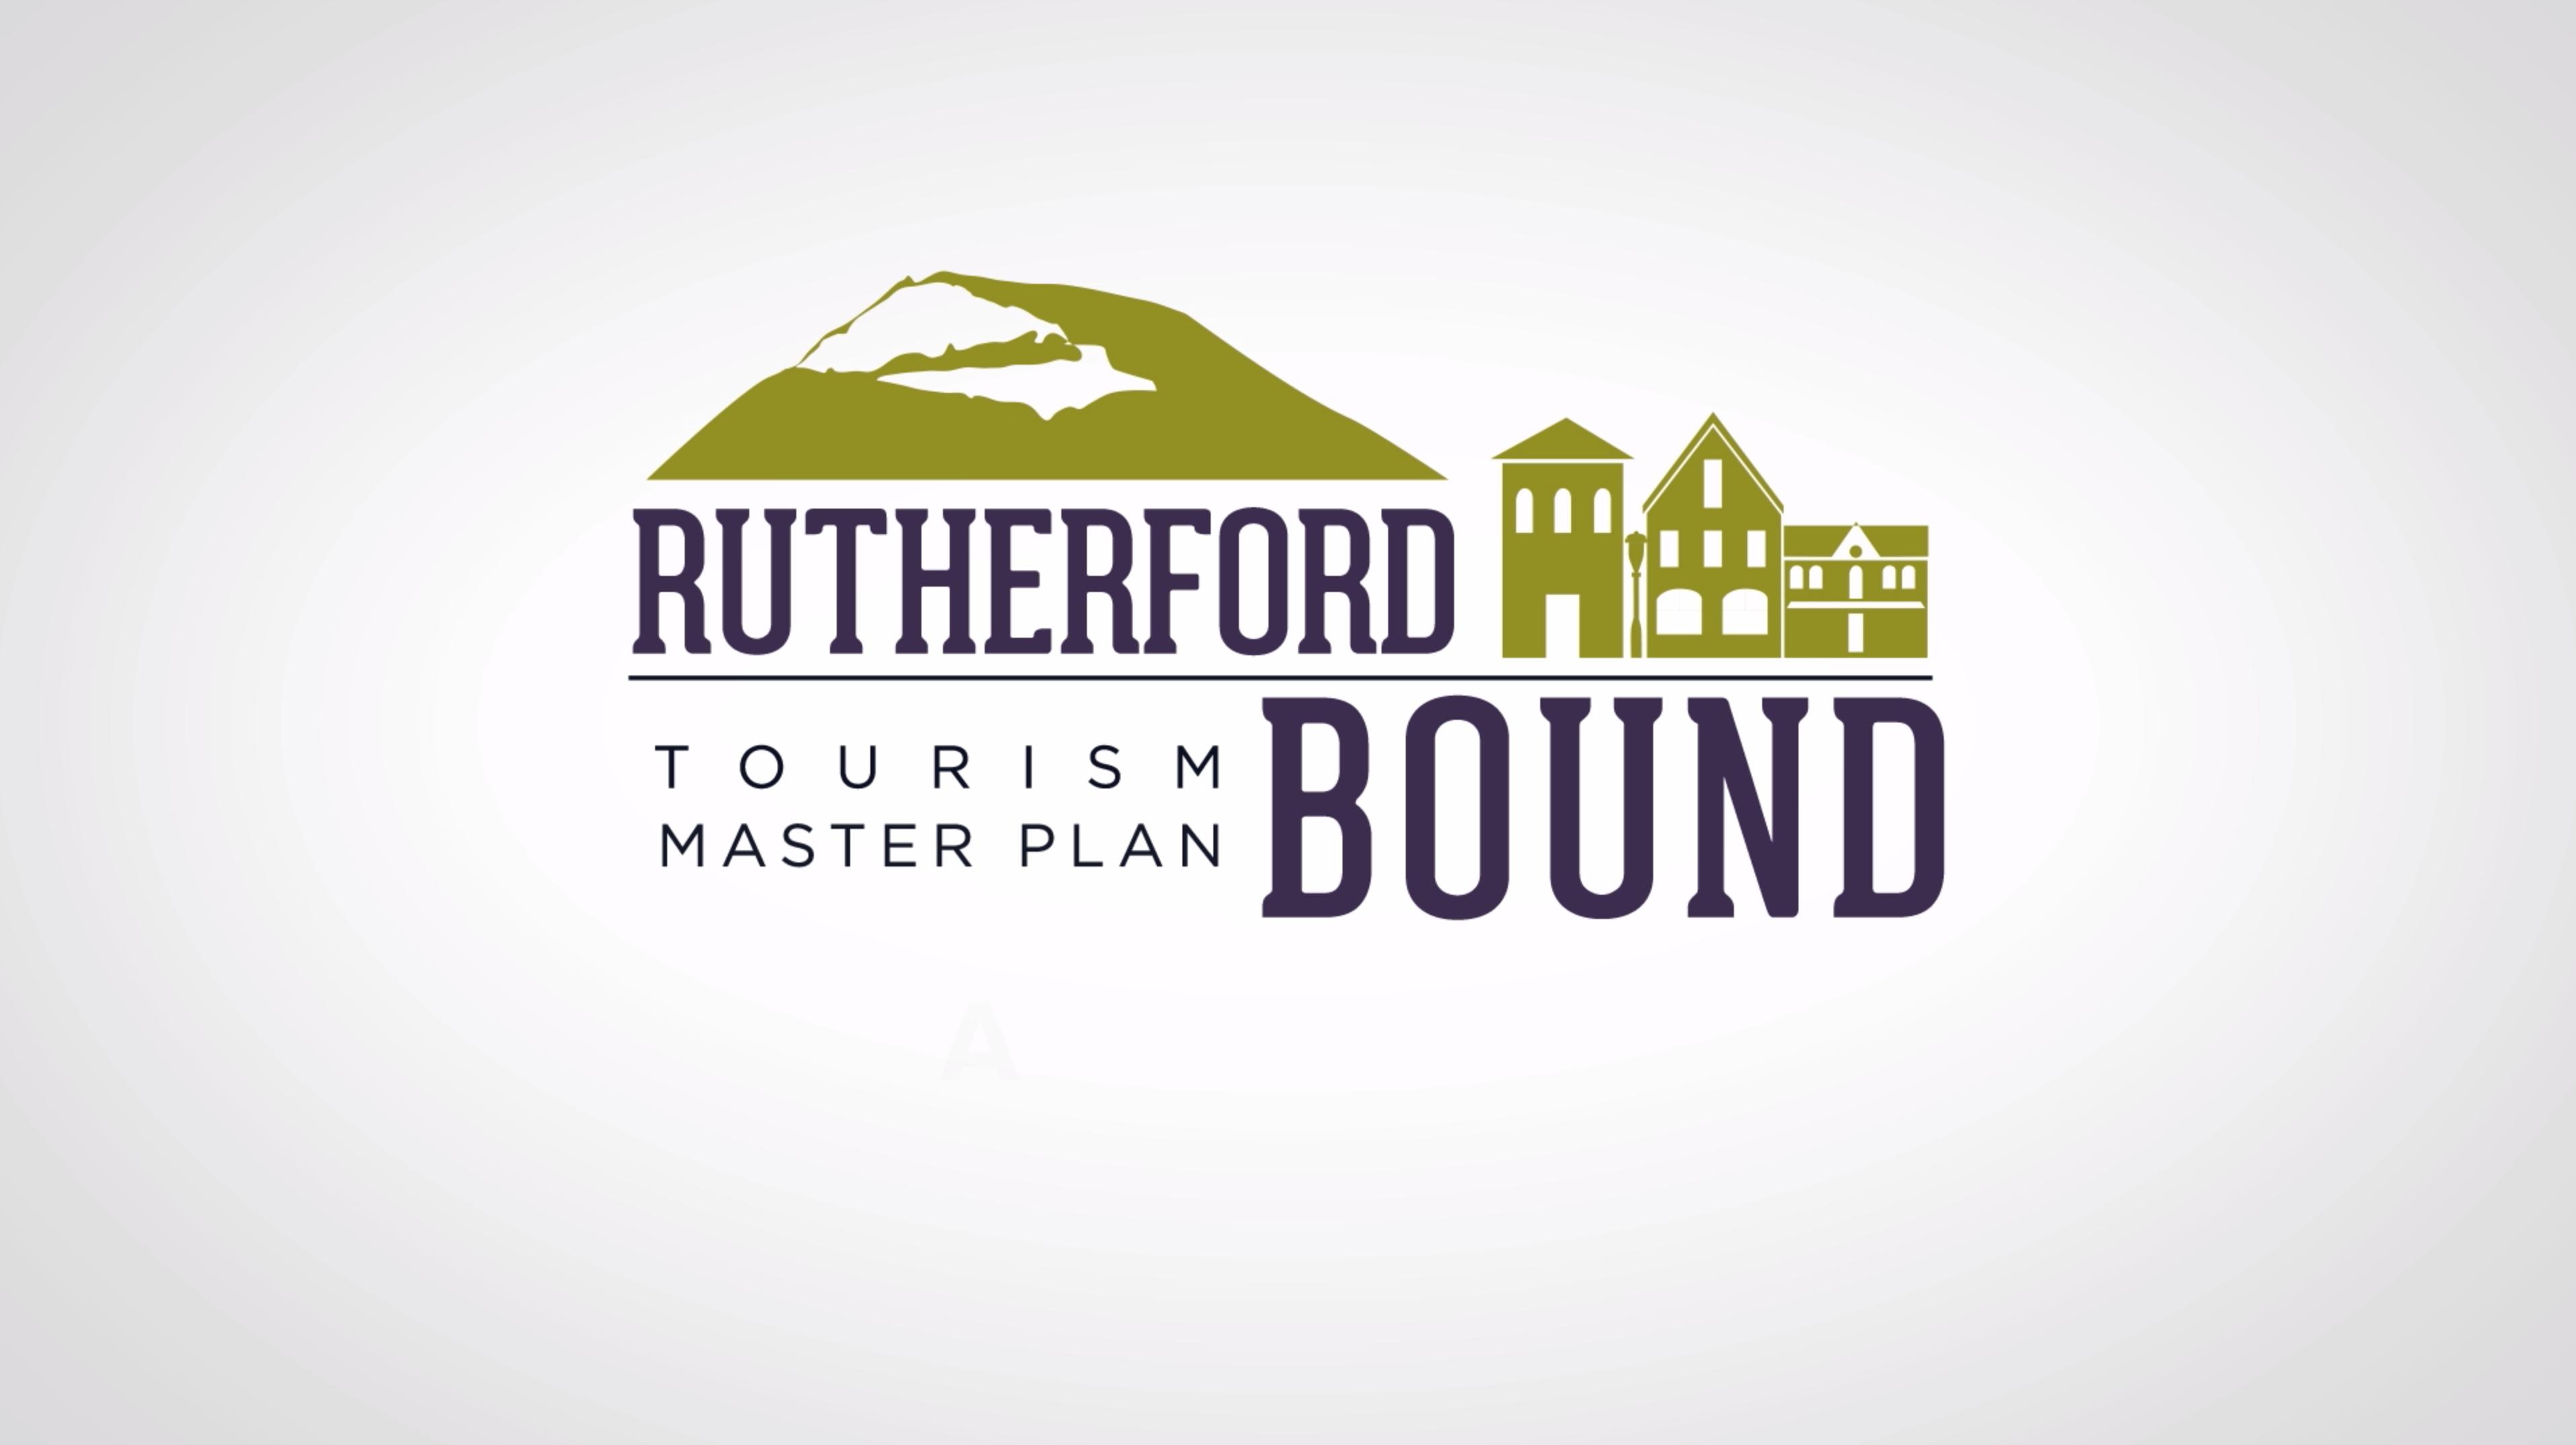 Rutherford Bound - Tourism Master Plan